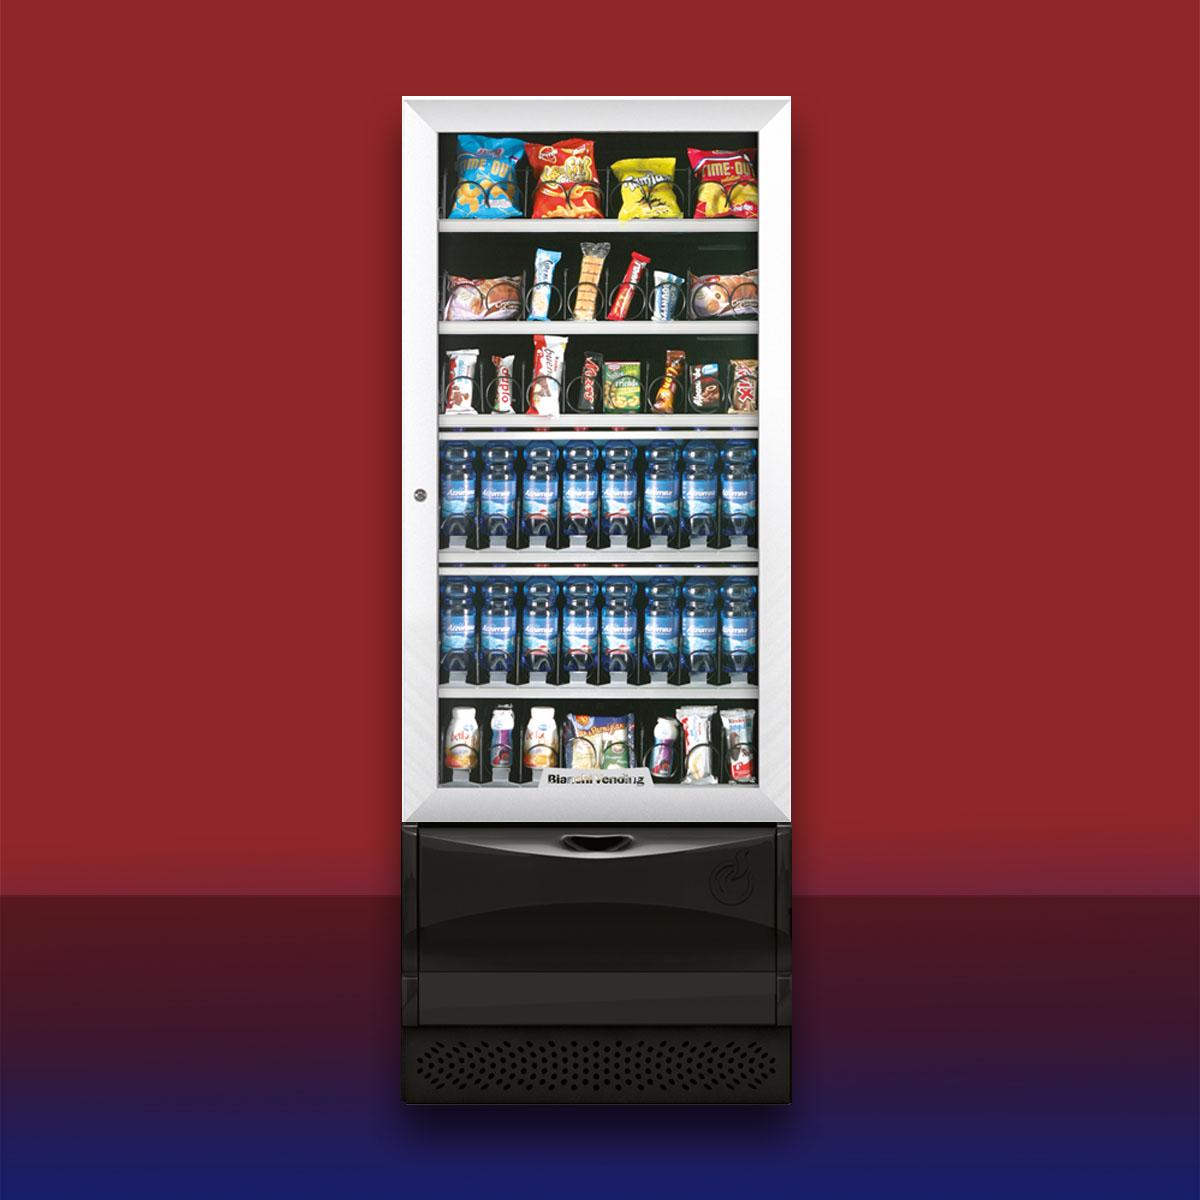 Slikautomater til kontorer, organisationer og forretninger - Kaffemøllen